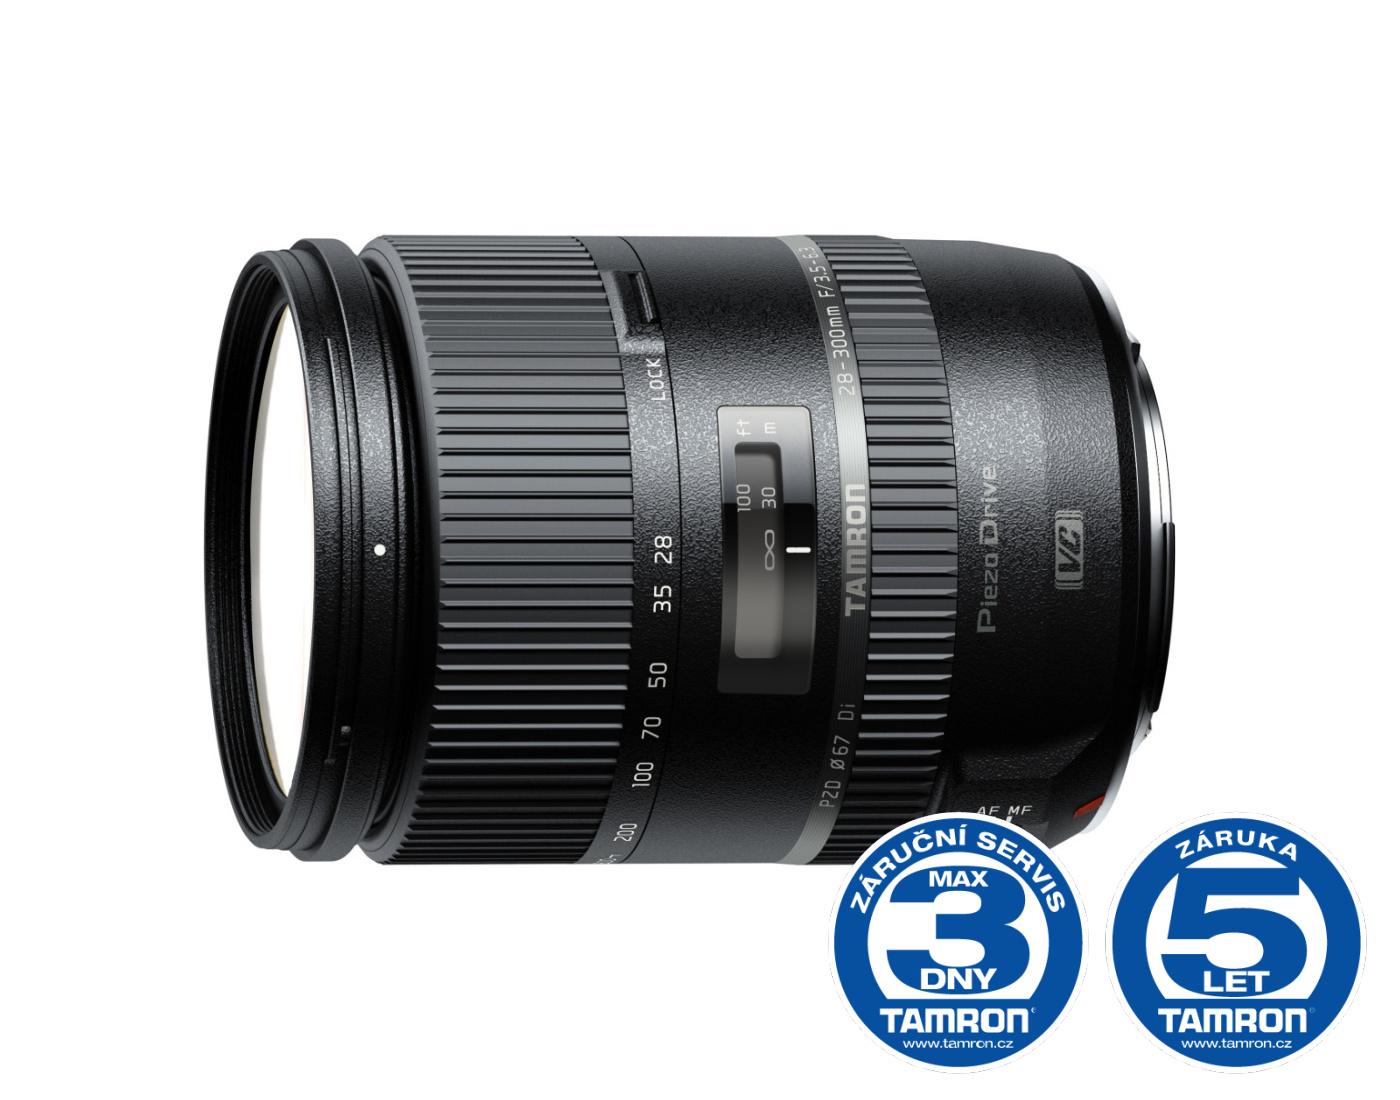 Tamron 28-300mm F/3.5-6.3 Di PZD Sony